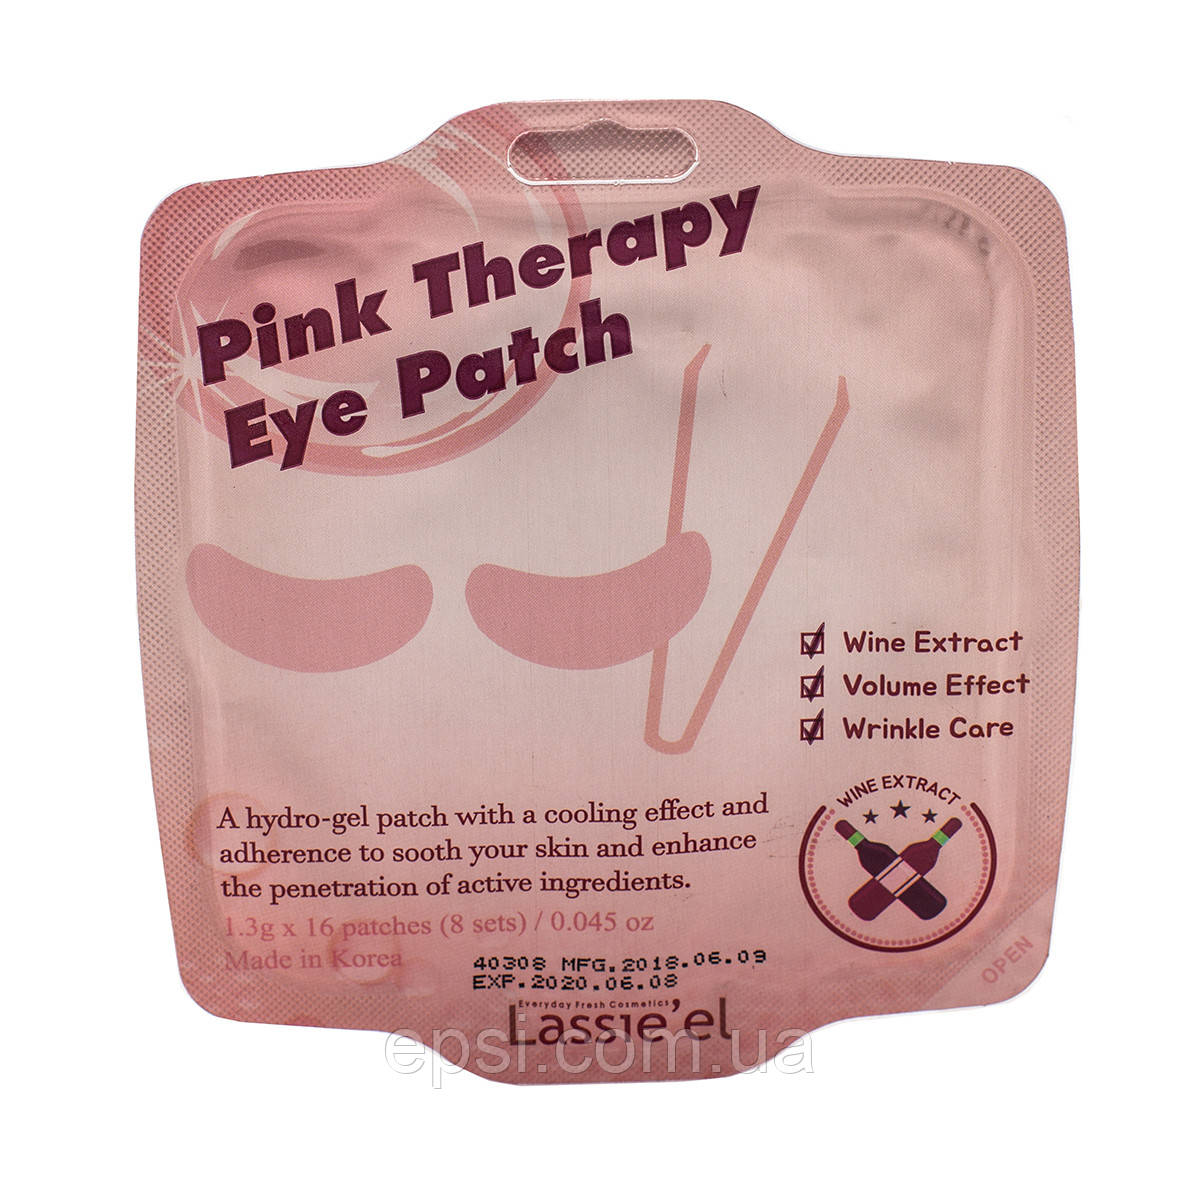 Гелевые патчи для области вокруг глаз Lassie el Pink Therapy Eye Patch, 21 г